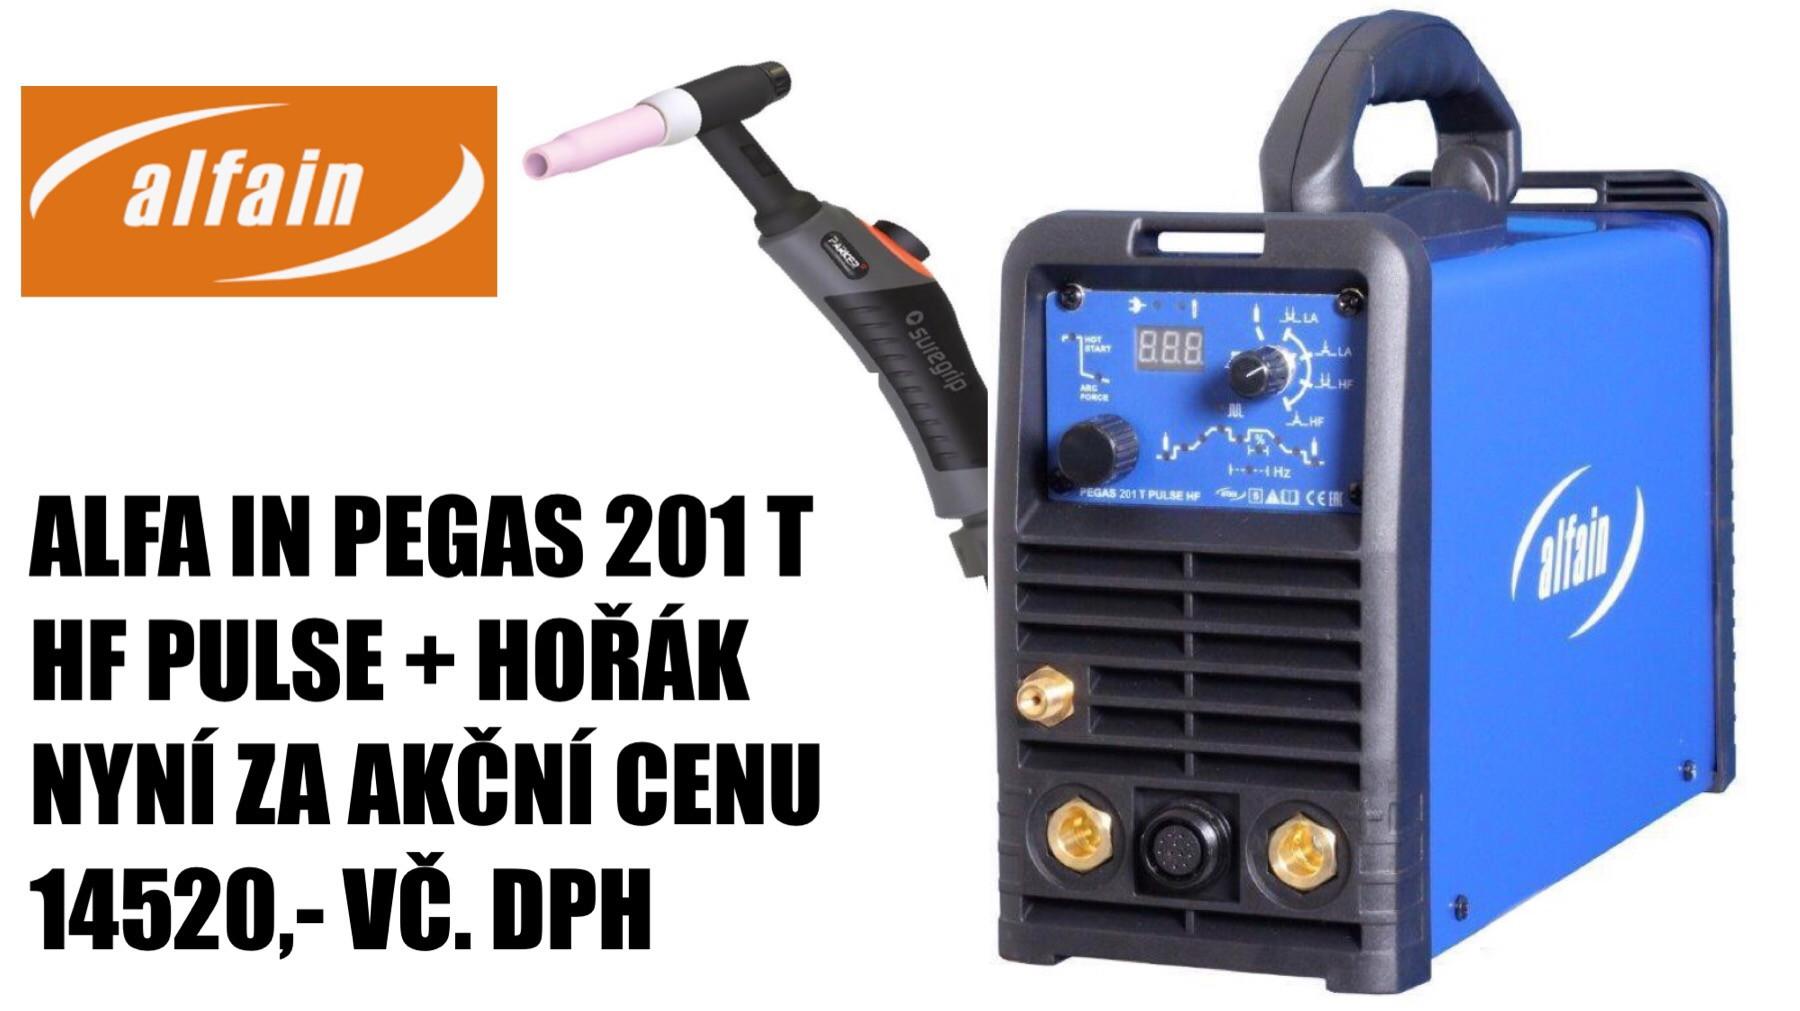 Akční cena Alfa in PEGAS 201 T HF PULSE + hořák